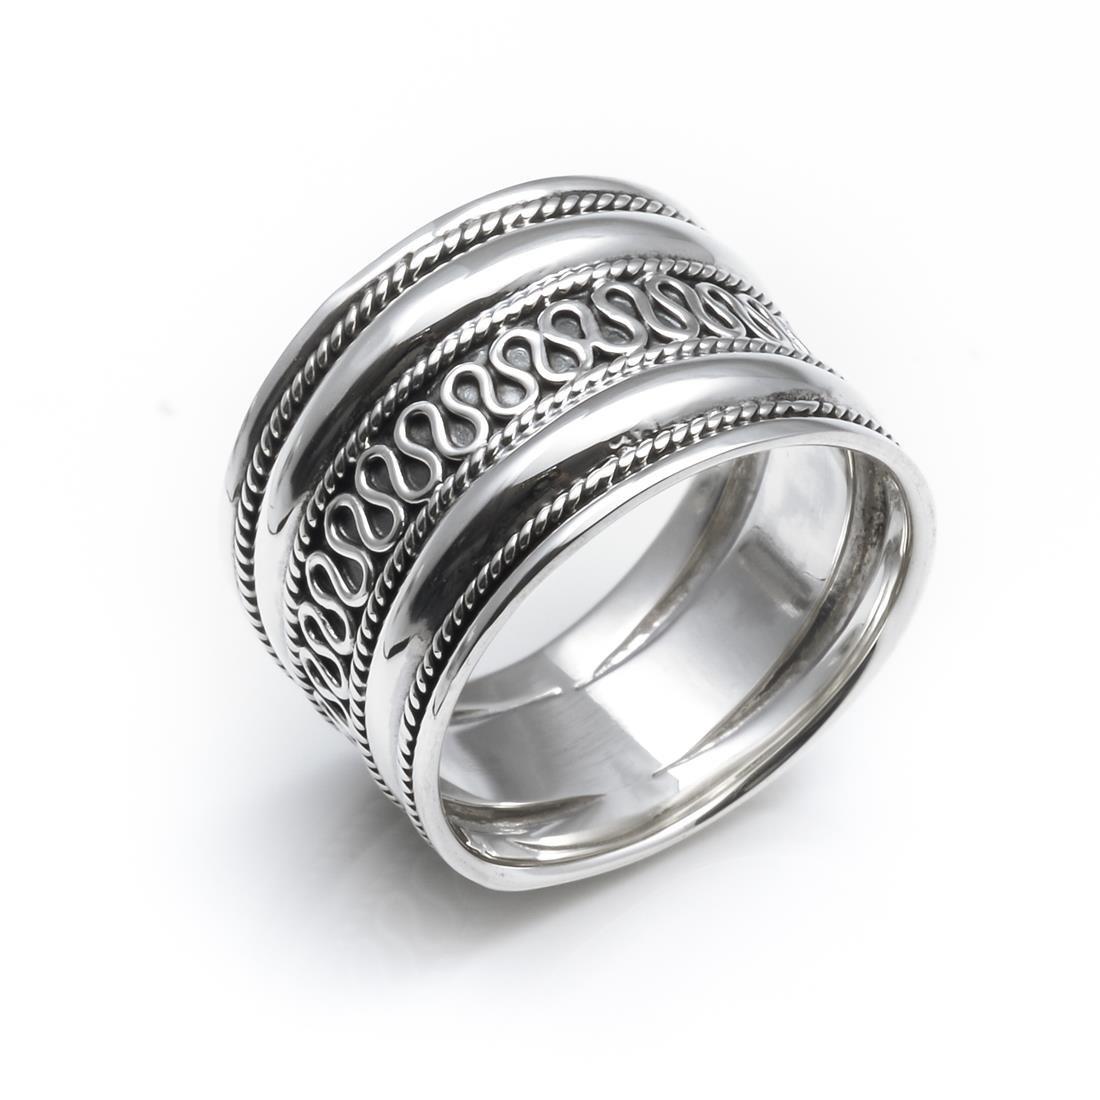 Silverly Anillo en Plata de Ley .925 Mujer Hombre Unisex Grueso Ancho Banda 18 mm Estilo Bali